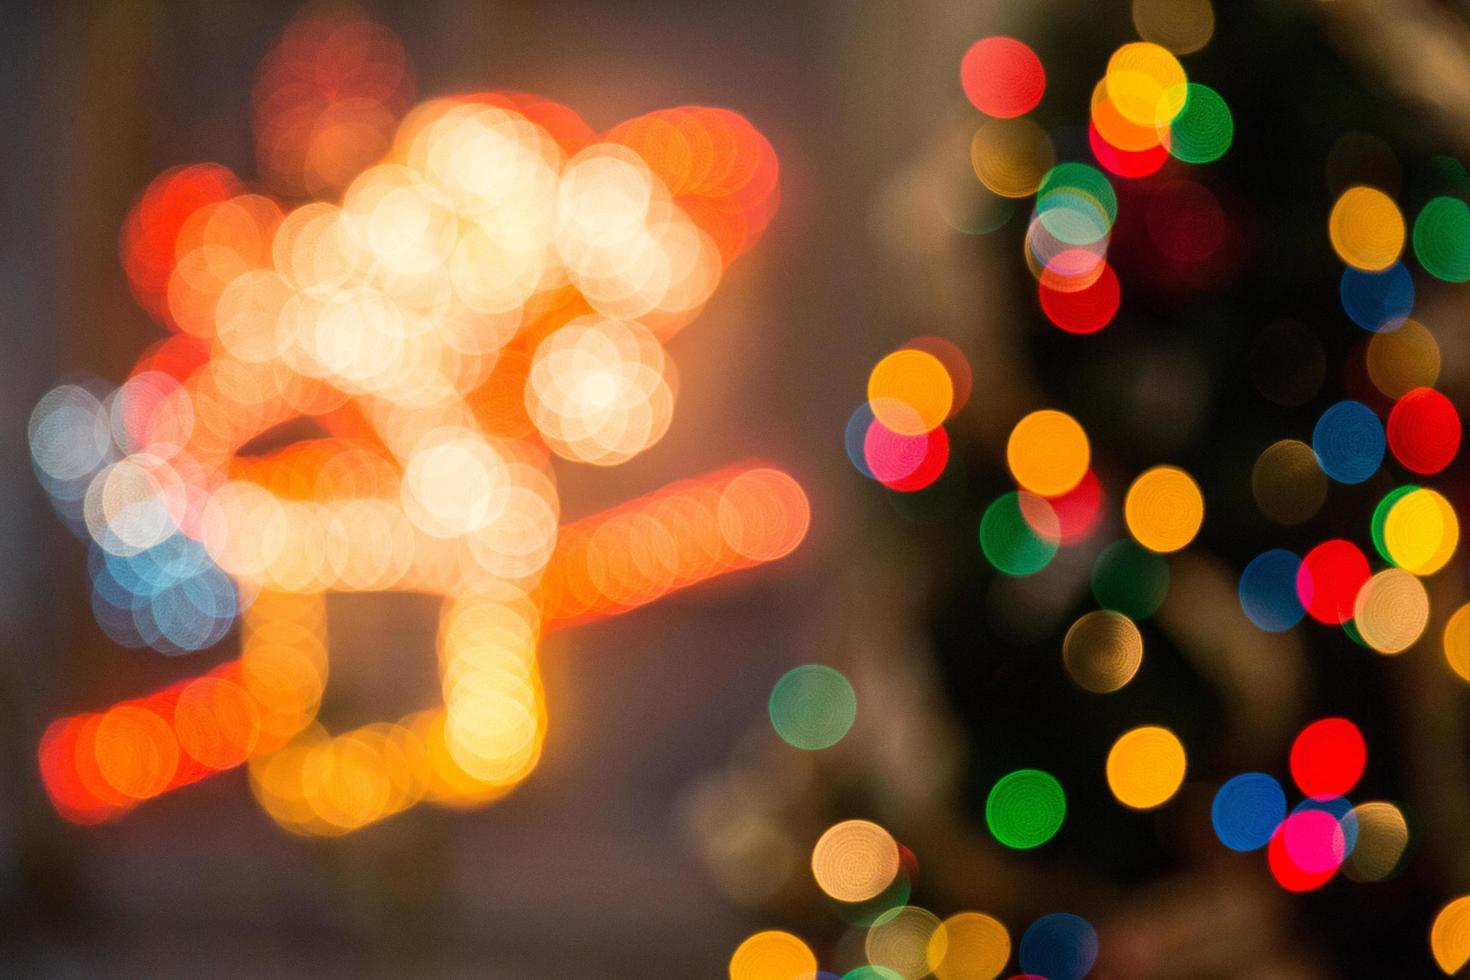 luci colorate assortite foto